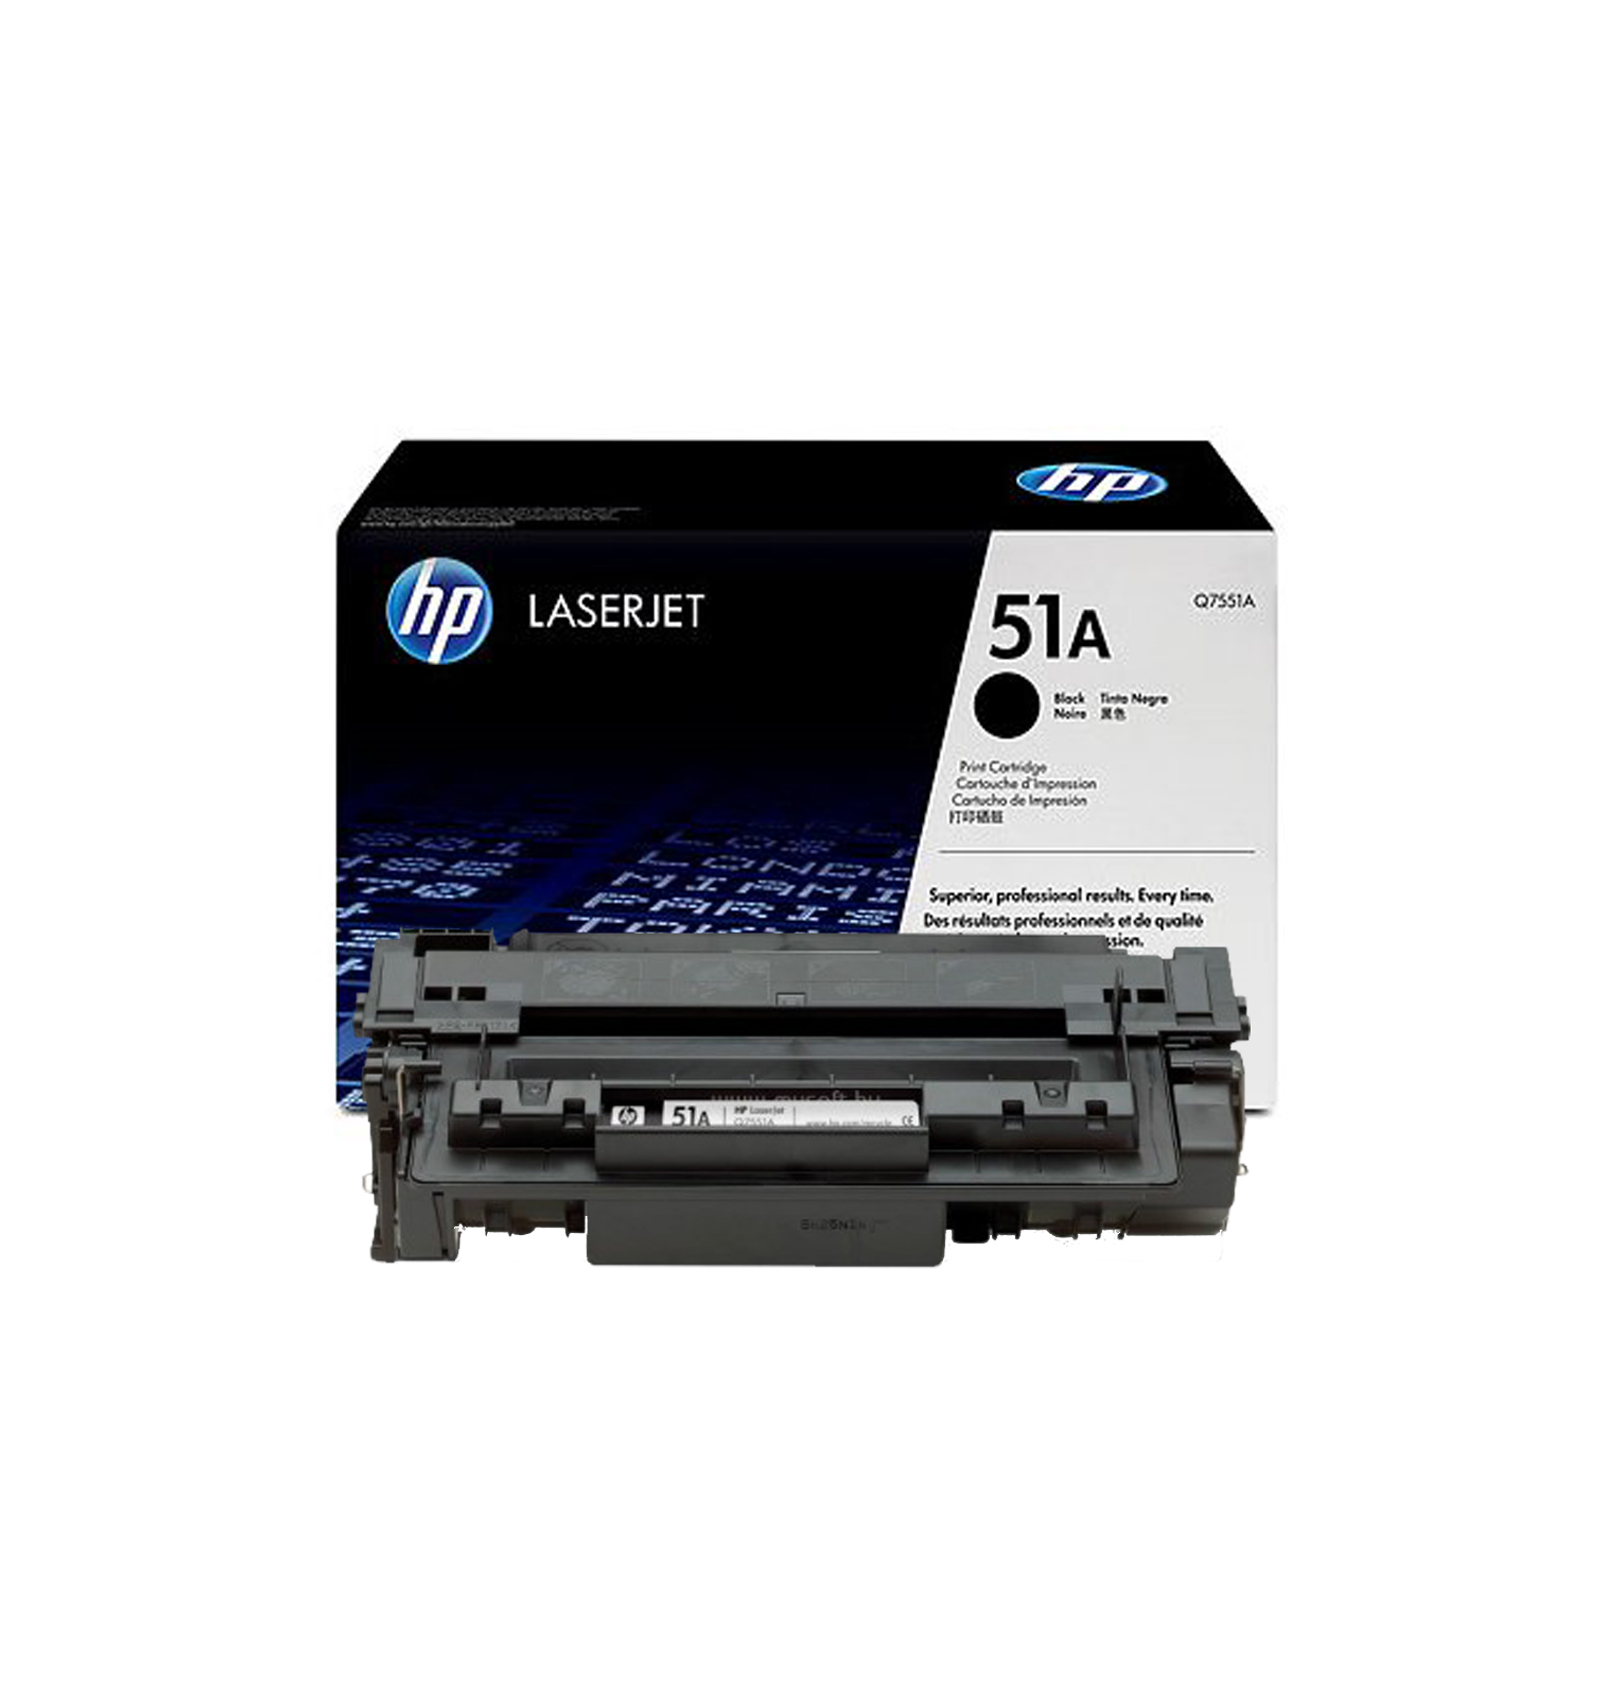 Заправка картриджей HP Q7551A (51A) для LaserJet P3005/M3027mfp/M3035mfp